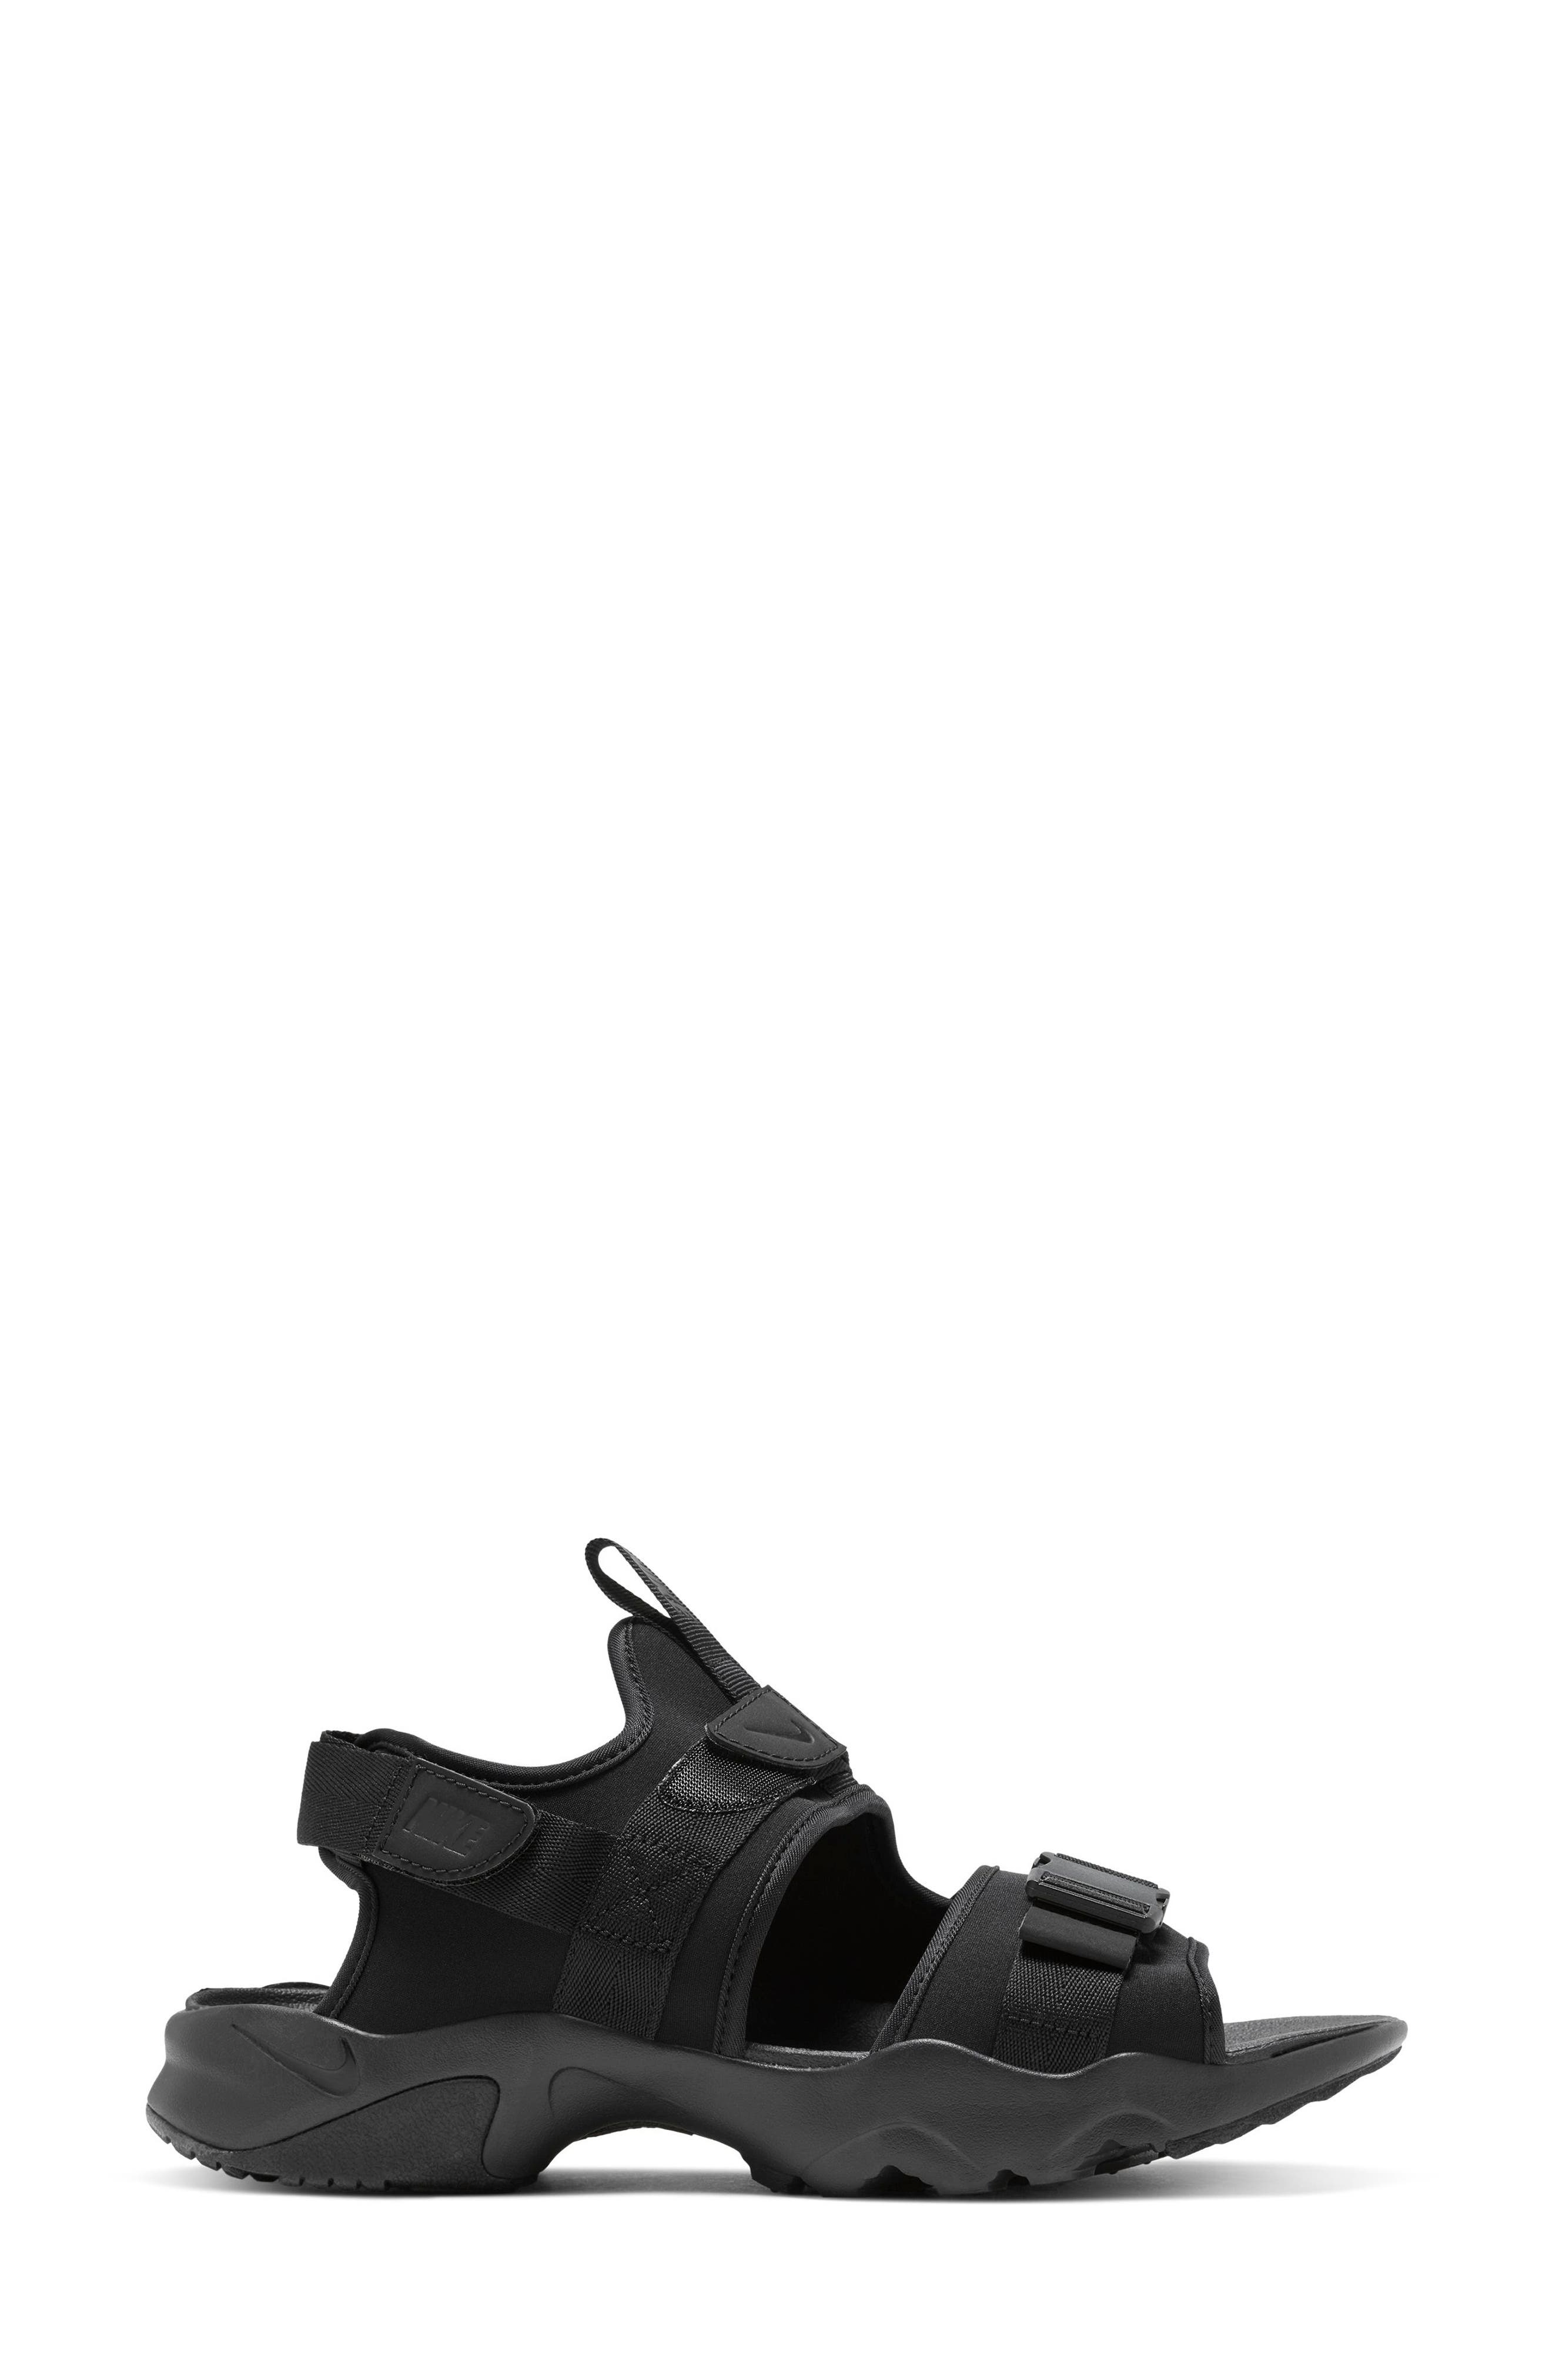 nike sandals for men